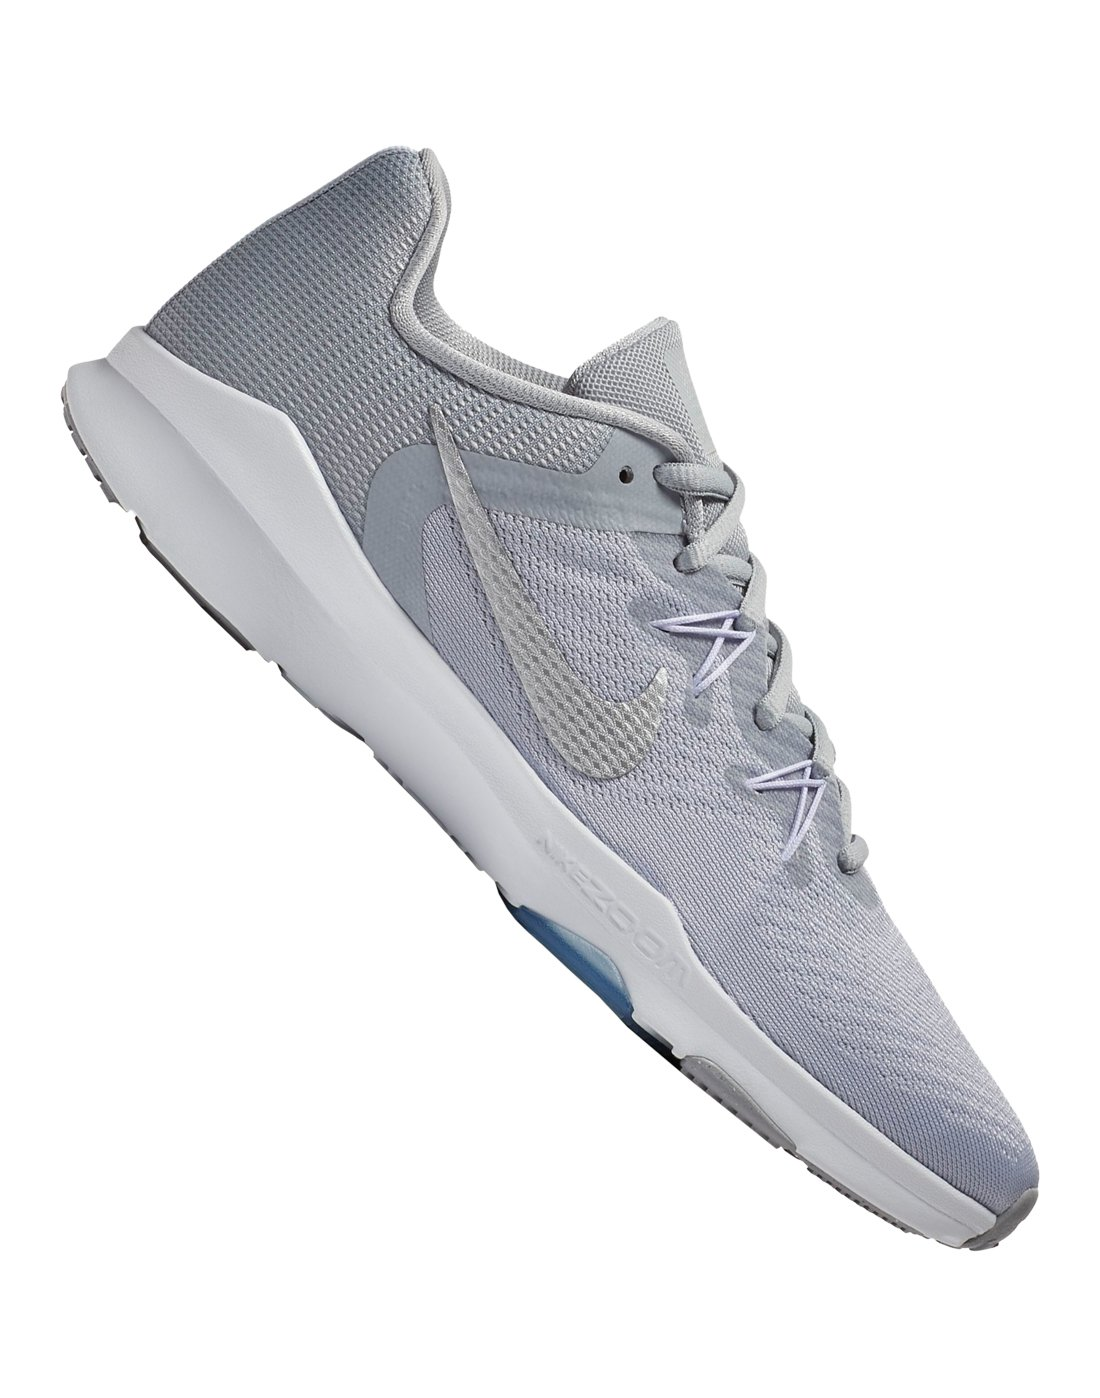 9c562c20066e1 Nike. Womens Zoom Condition TR 2. Womens Zoom Condition TR 2 ...